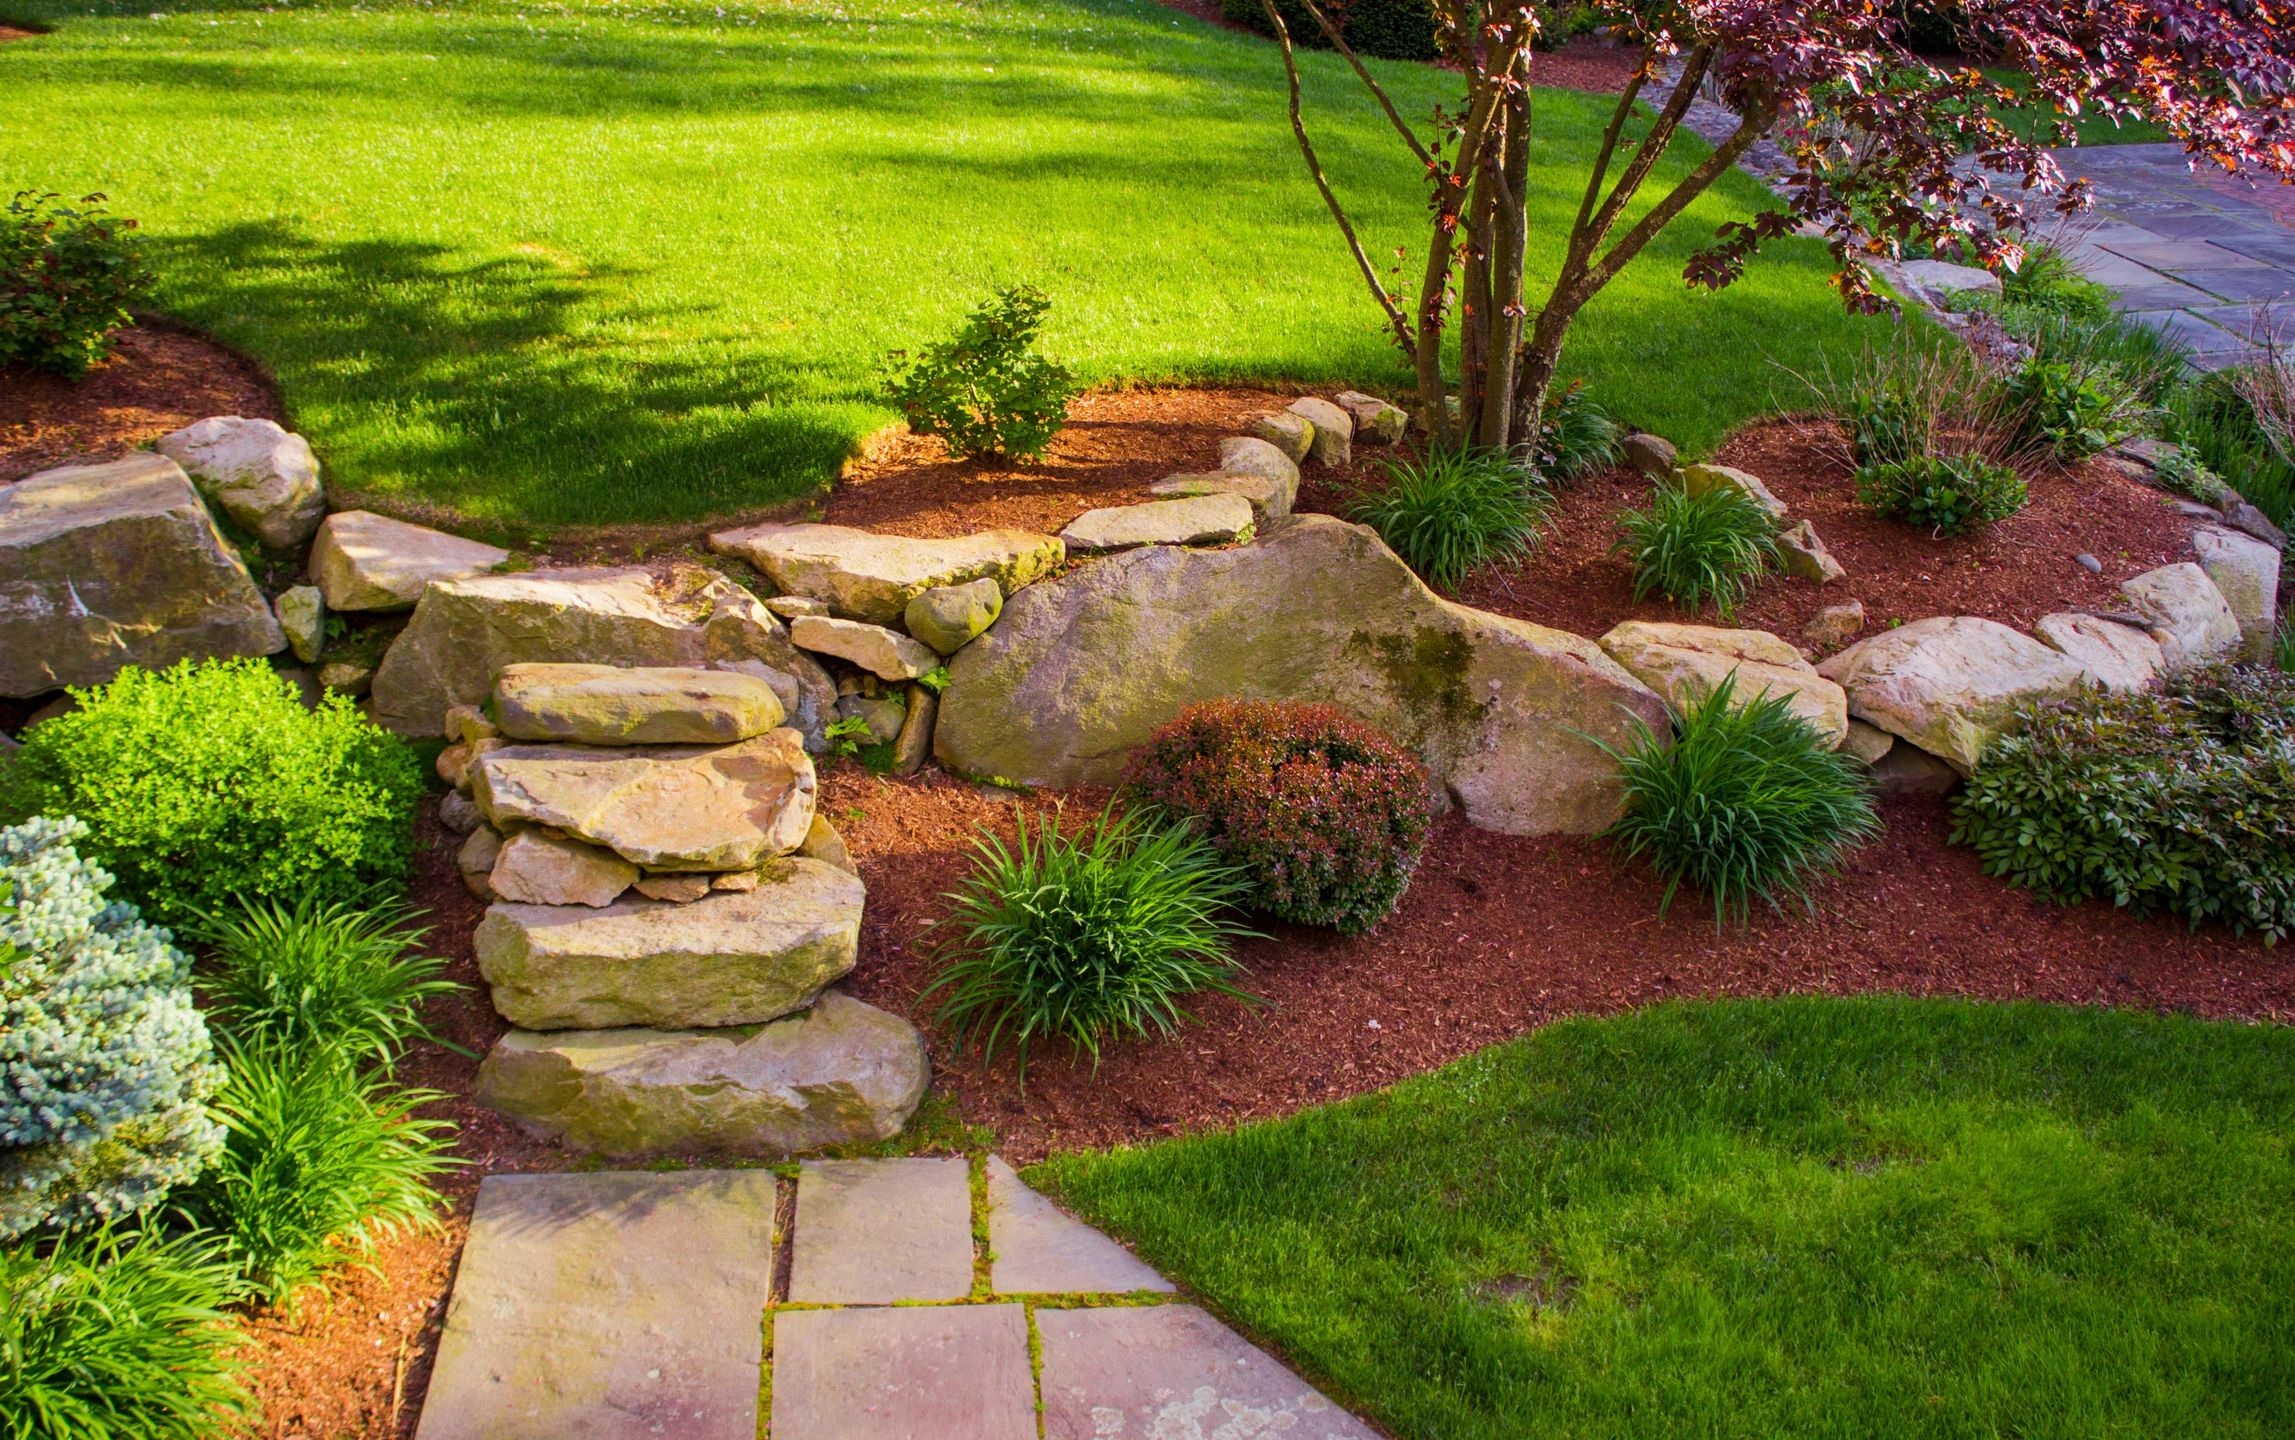 Stone Stairway and Garden